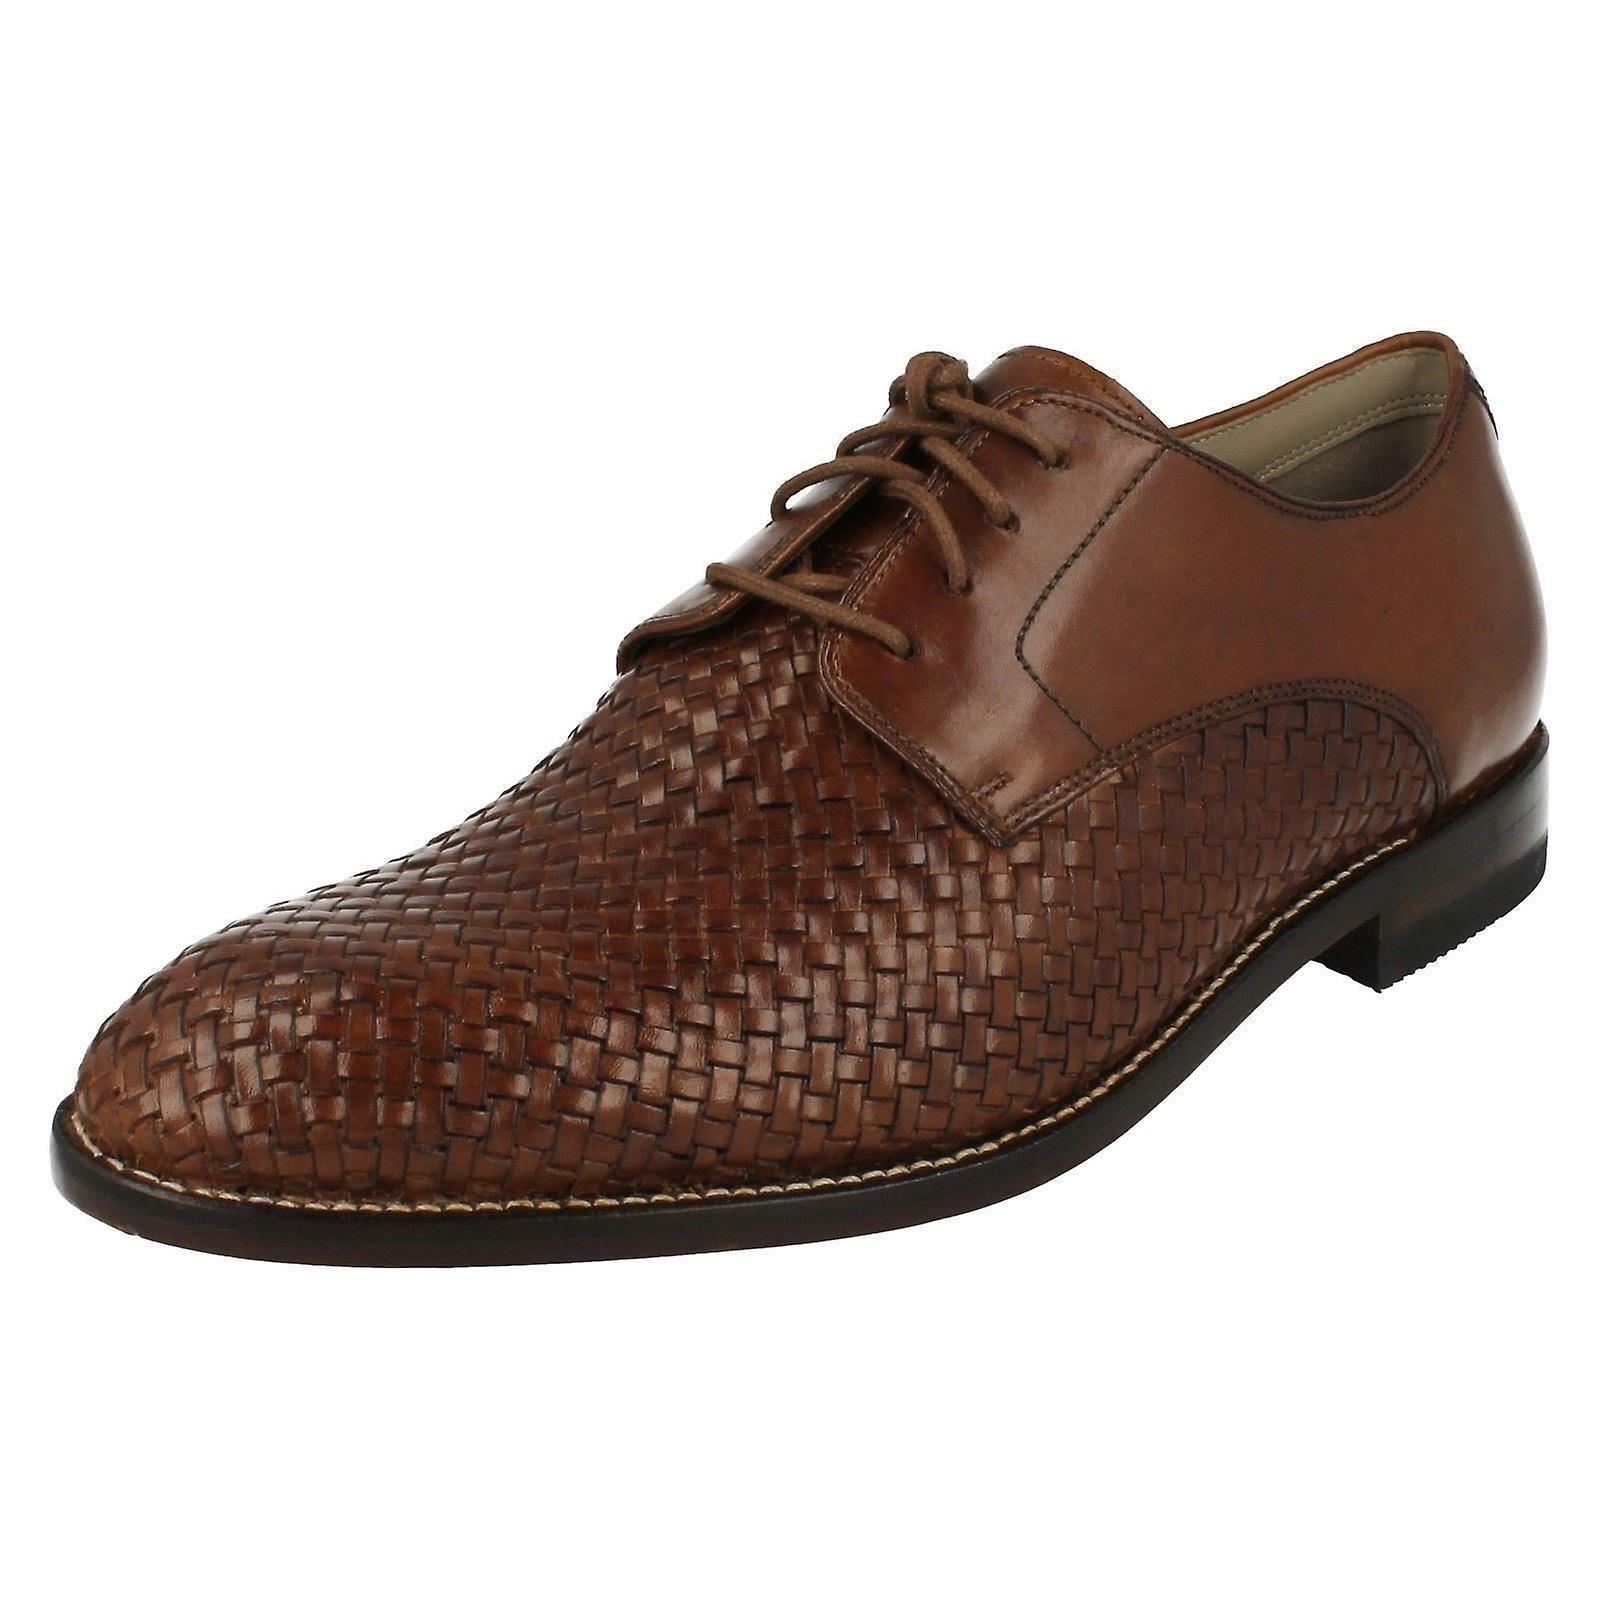 Herren Clarks Smart Lace Up Schuhe Twinley Spitze